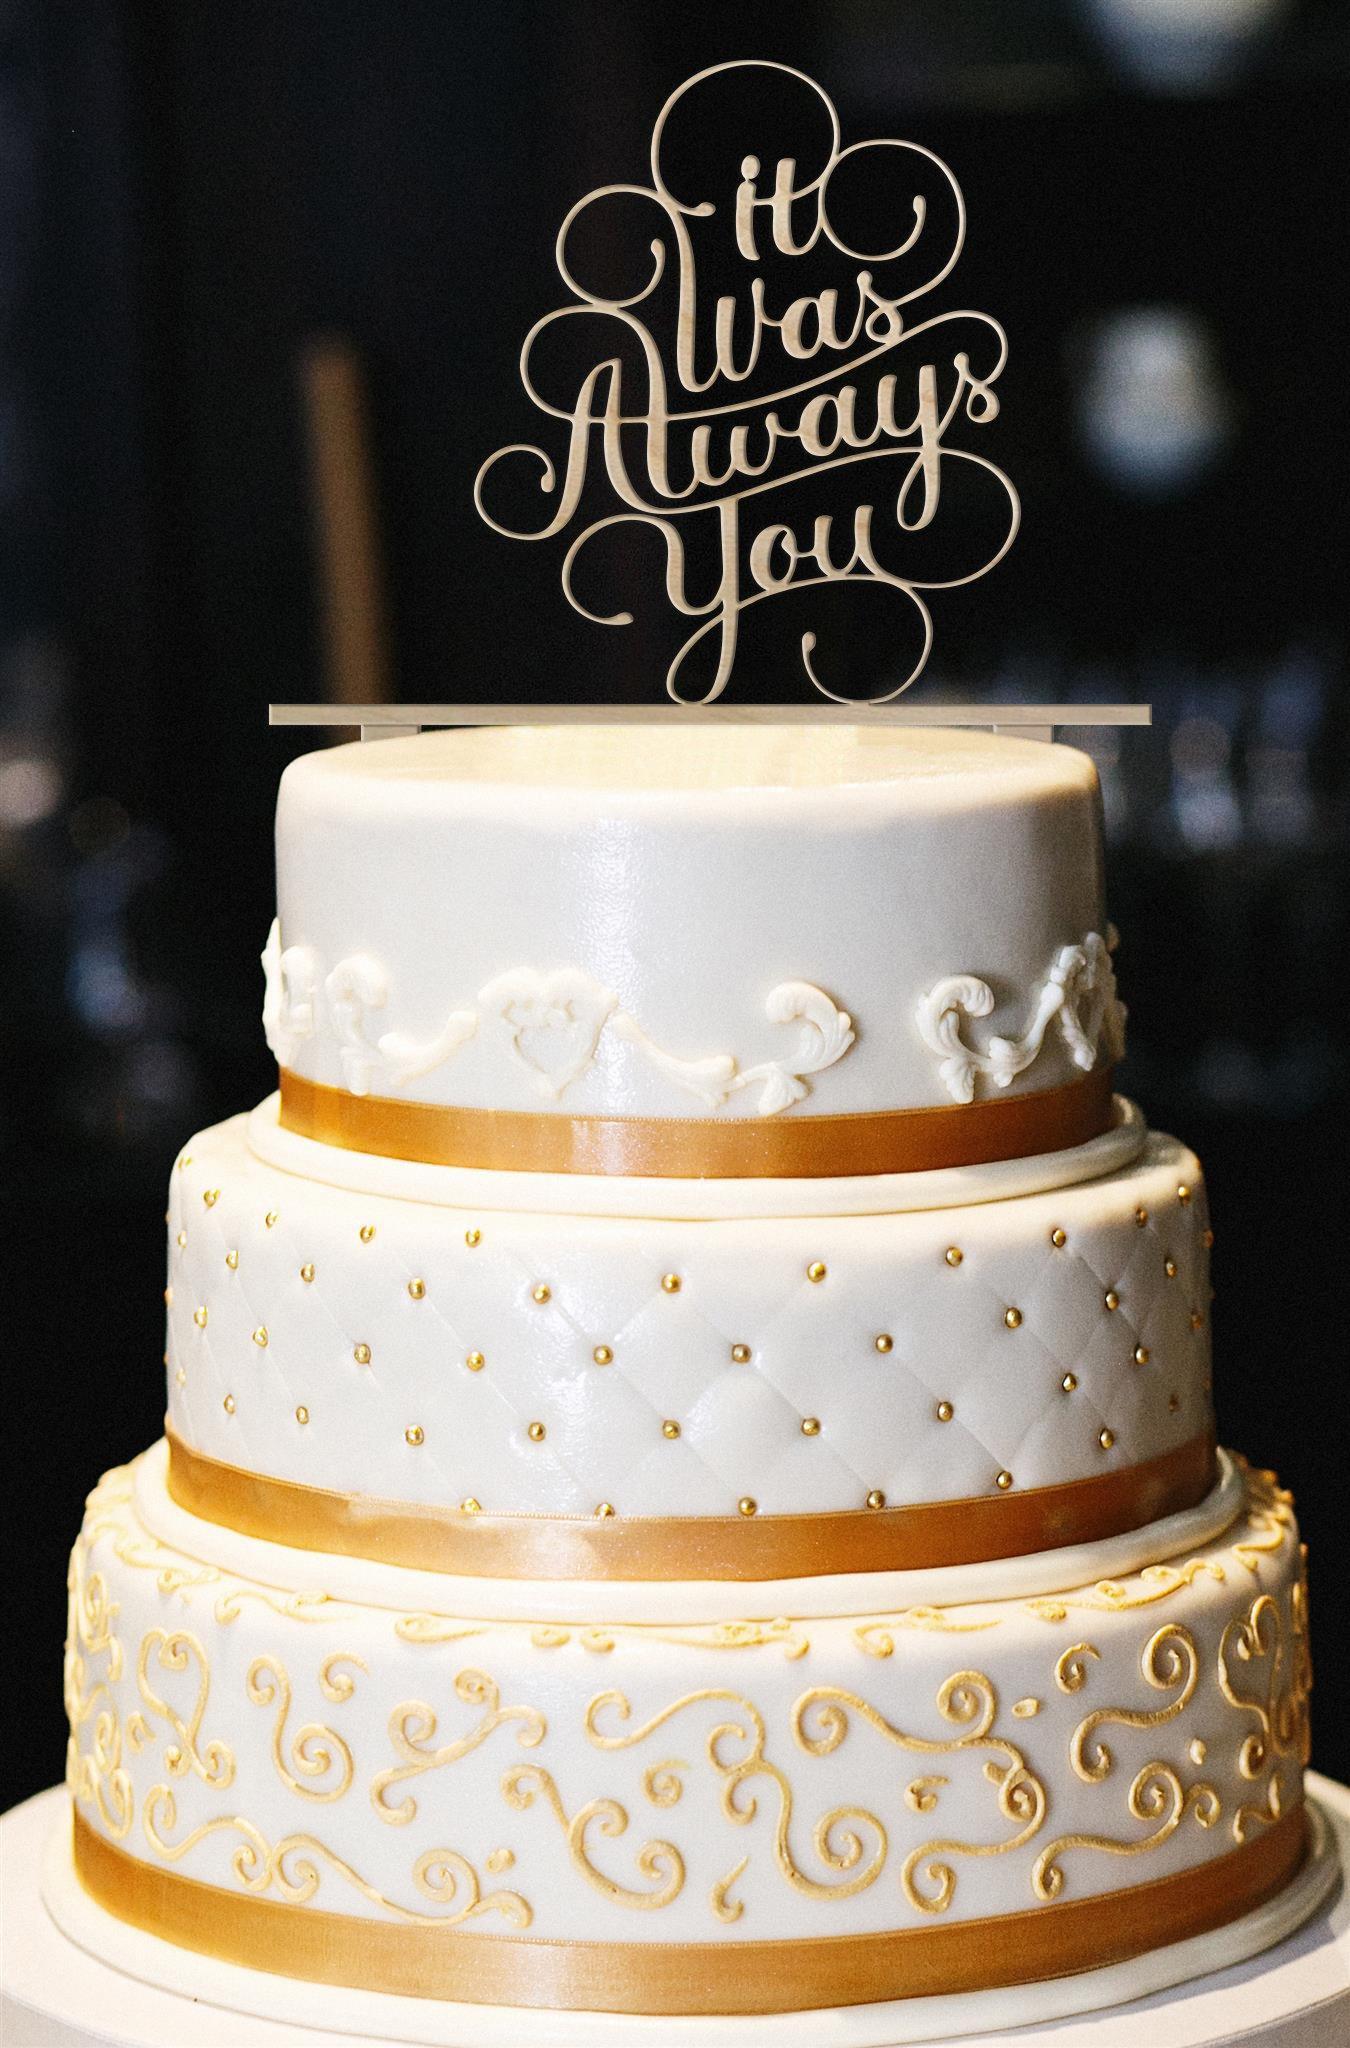 It Was Always You Wedding Cake Topper, Glitter Wedding Cake Topper, Engagement Cake Topper, Gold Cake Topper, Gold Glitter Cake Topper (5'', Wood)